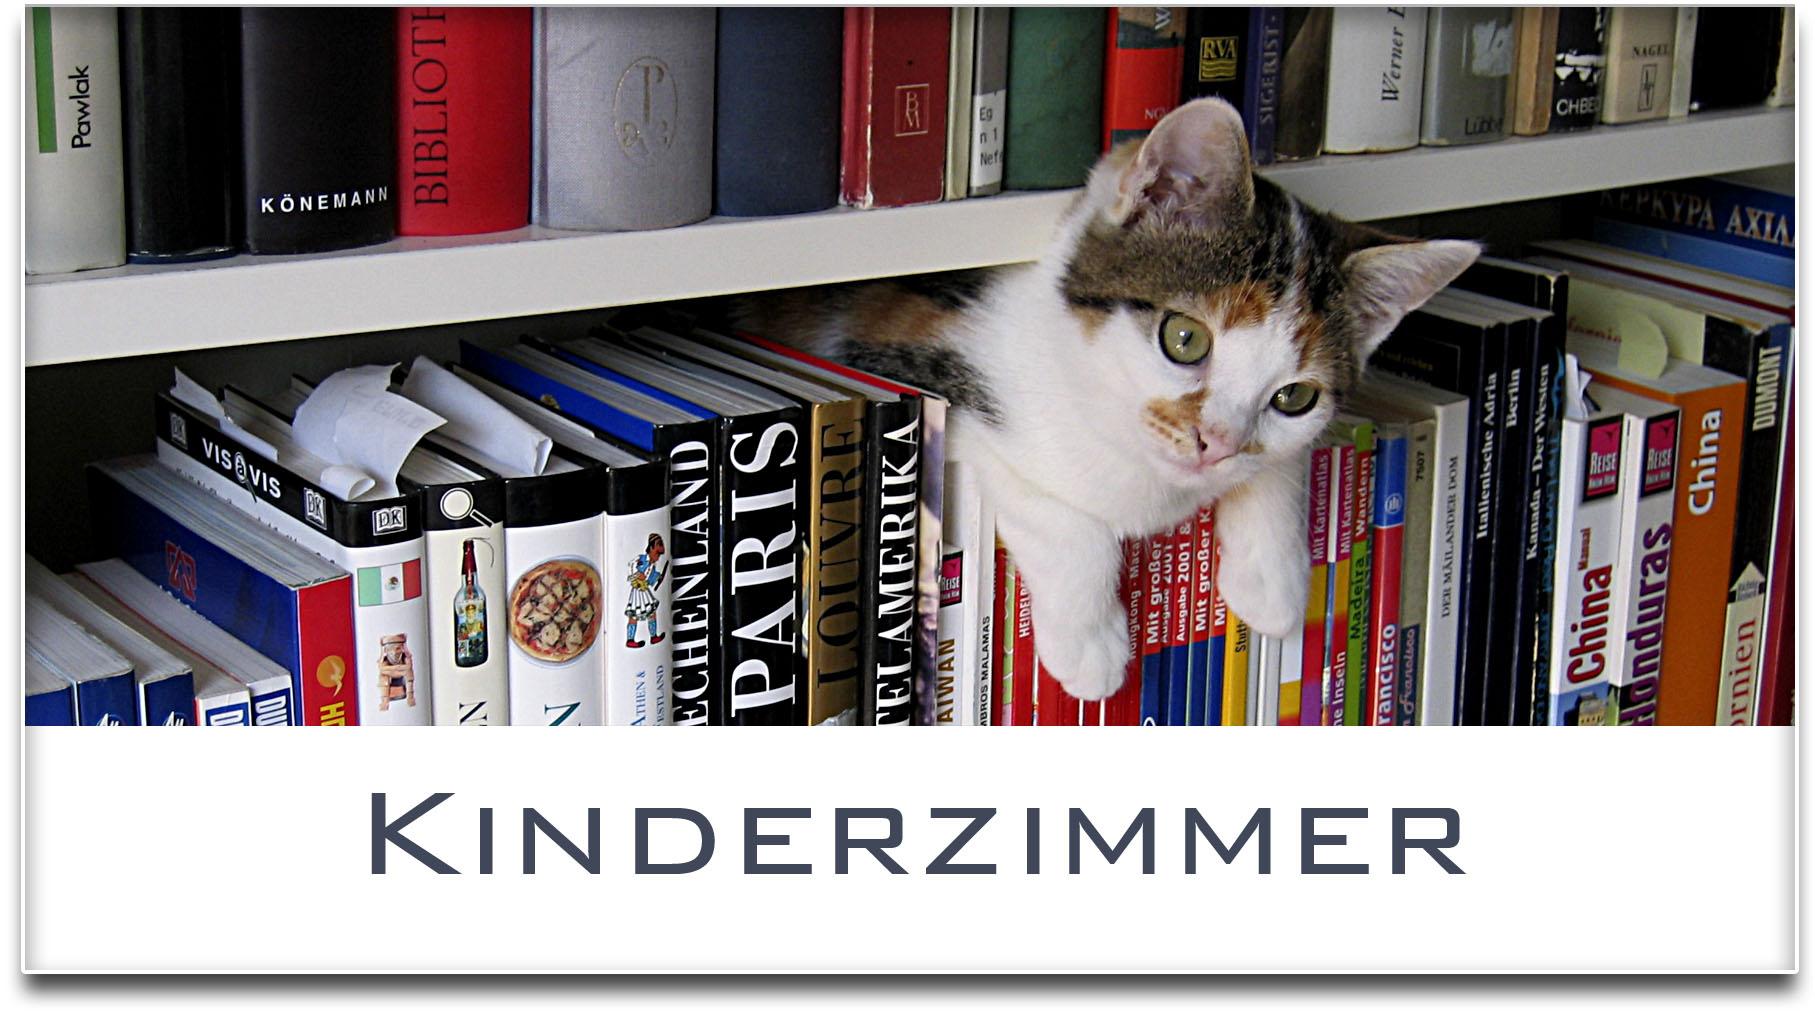 Türschild / Haustürschild / Katze / Bücherregal / Kinderzimmer / Selbstklebend